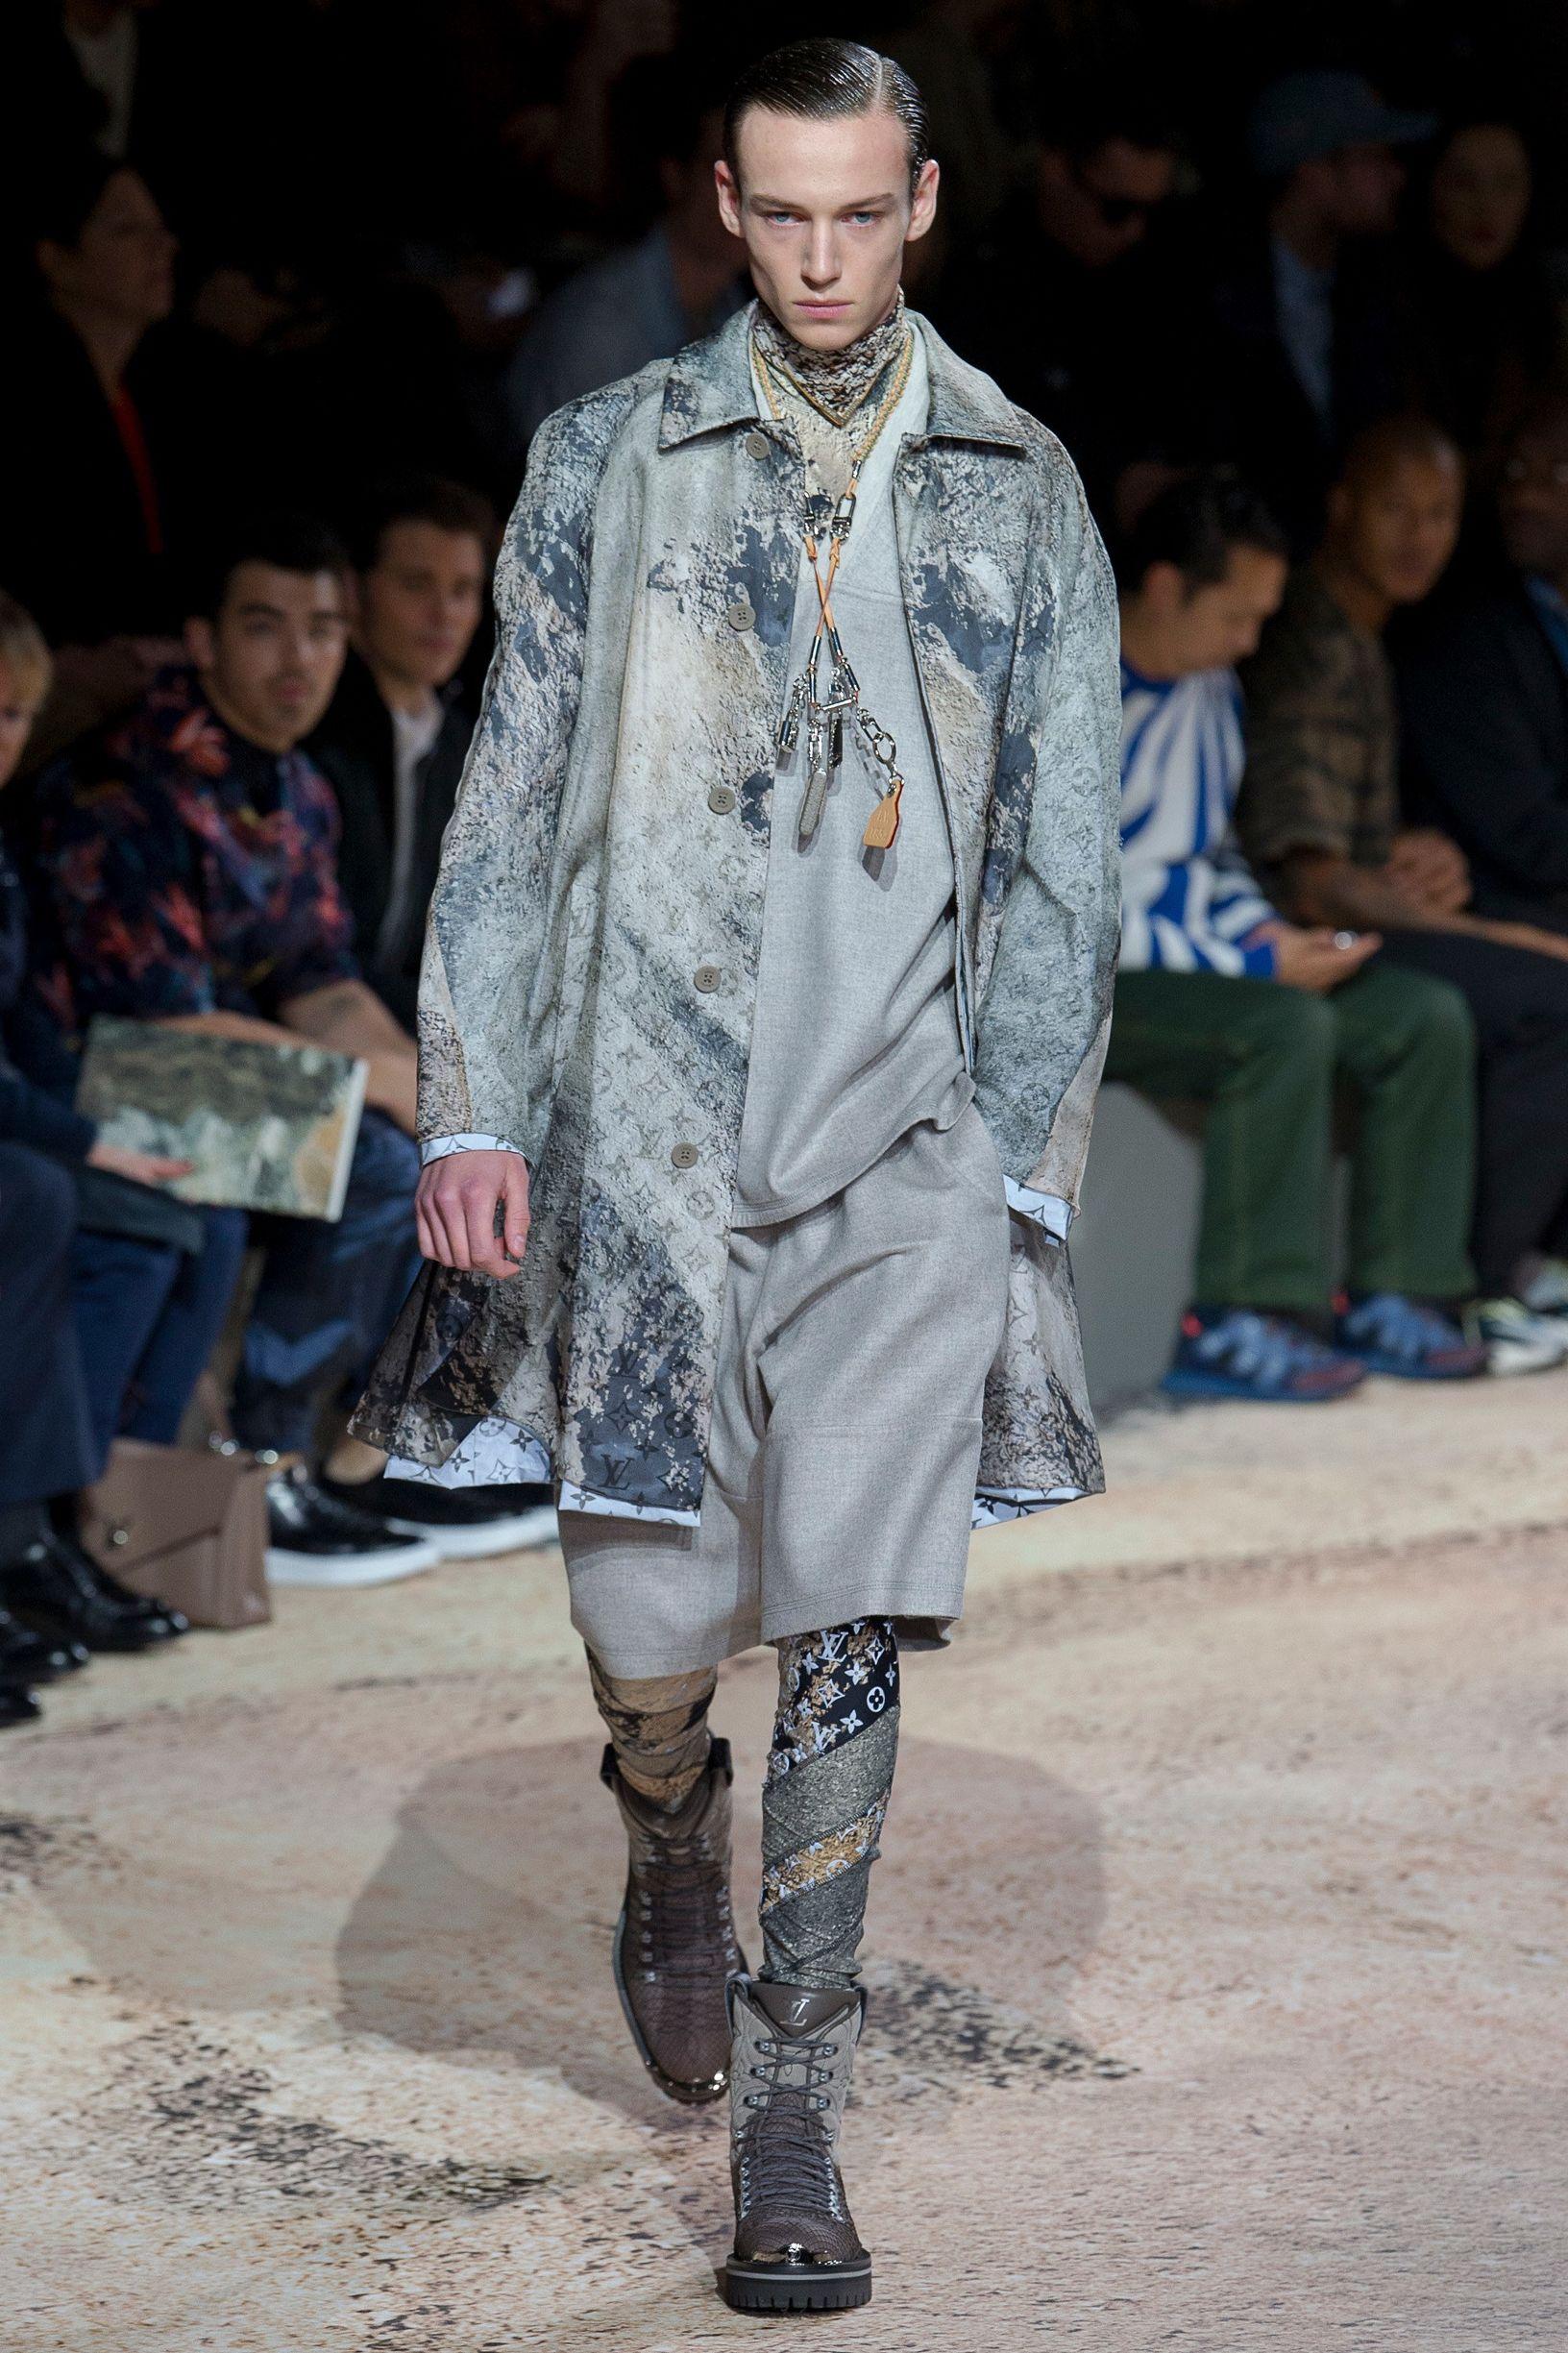 Louis Vuitton 2018秋冬男装系列——Kim Jones卸任之作